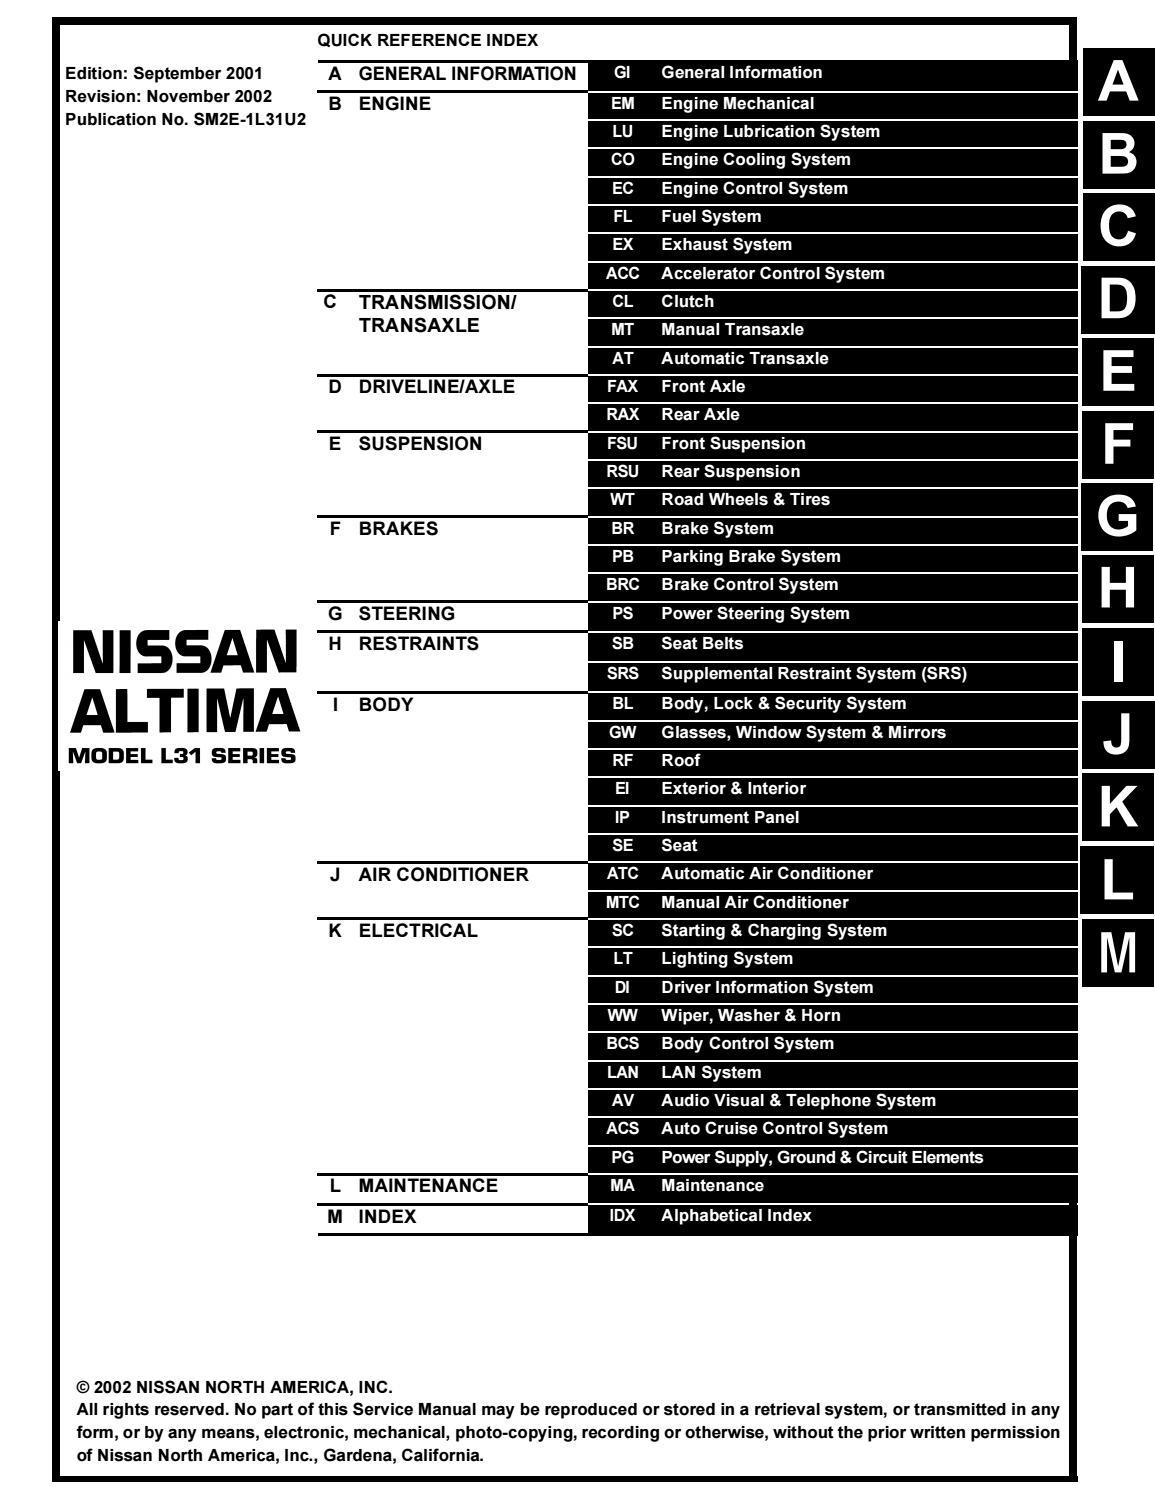 2002 nissan altima service repair manual by 16310168 - issuu  issuu